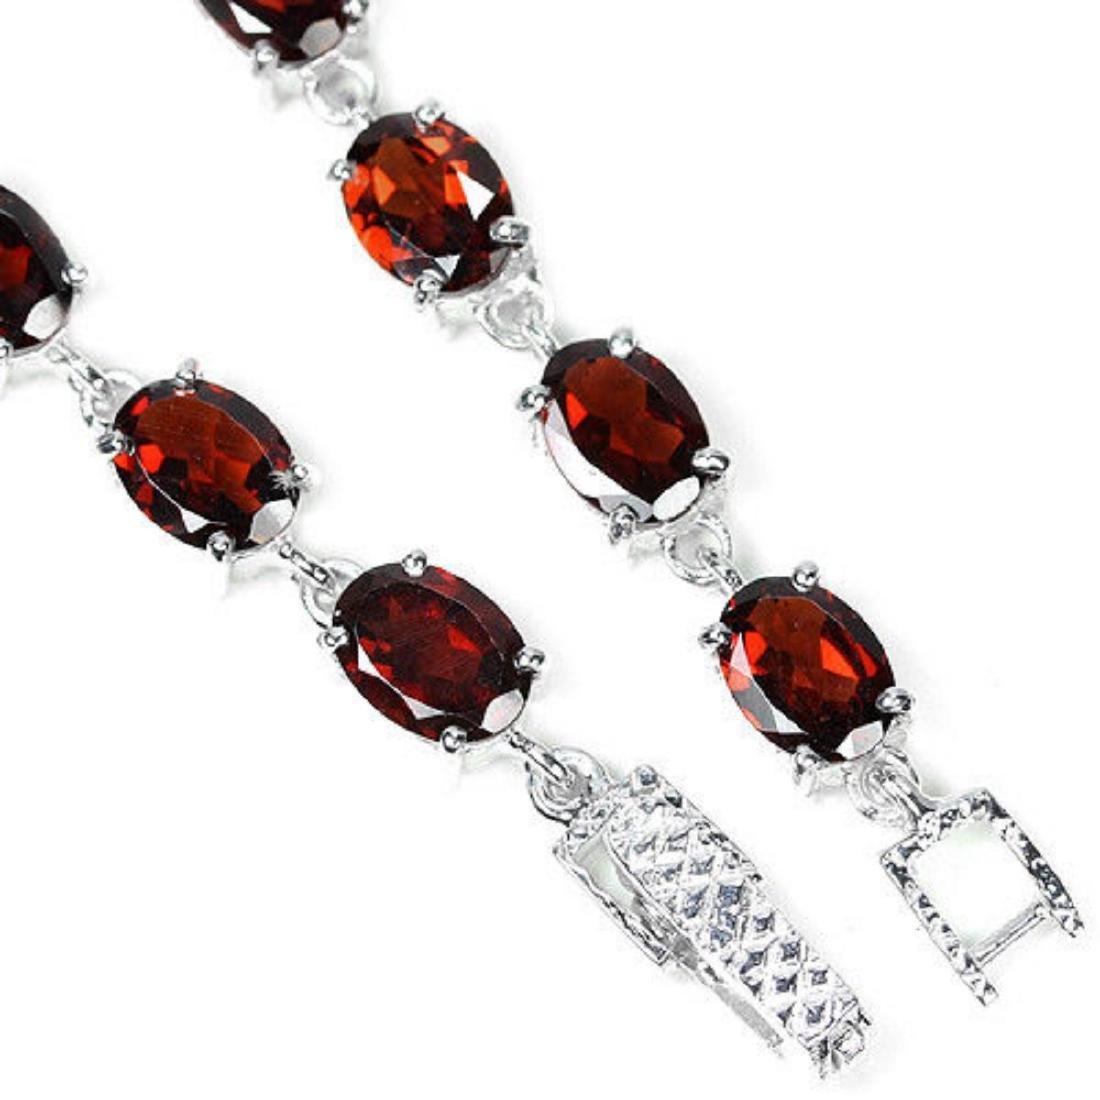 NATURAL AAA DRAK ORANGE RED GARNET Bracelet - 3